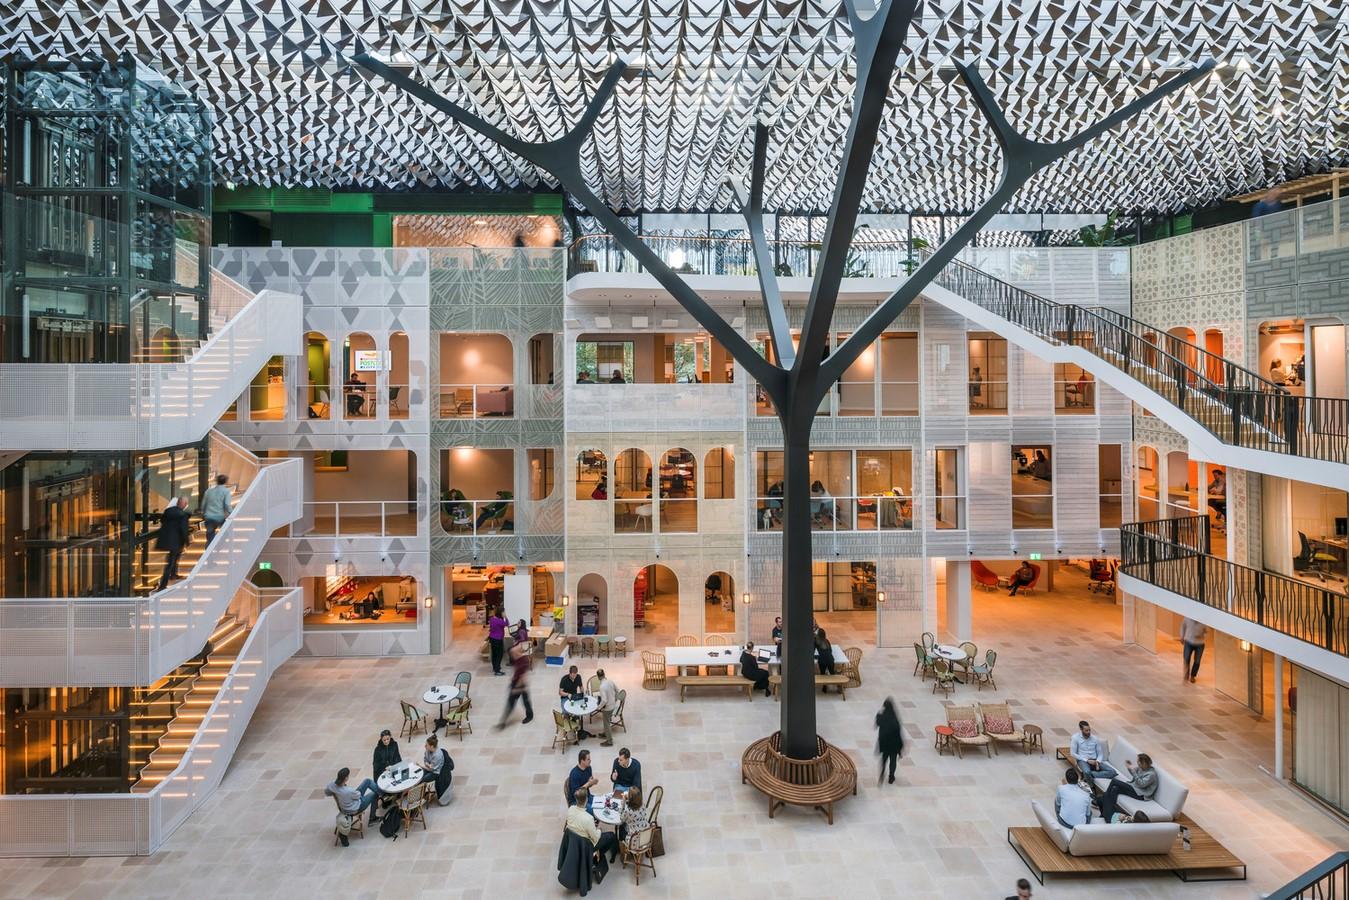 Goede Doelen Loterijen & Dutch Charity Lotteries Head Offices by Benthem Crouwel Architects: Under one roof - Sheet1